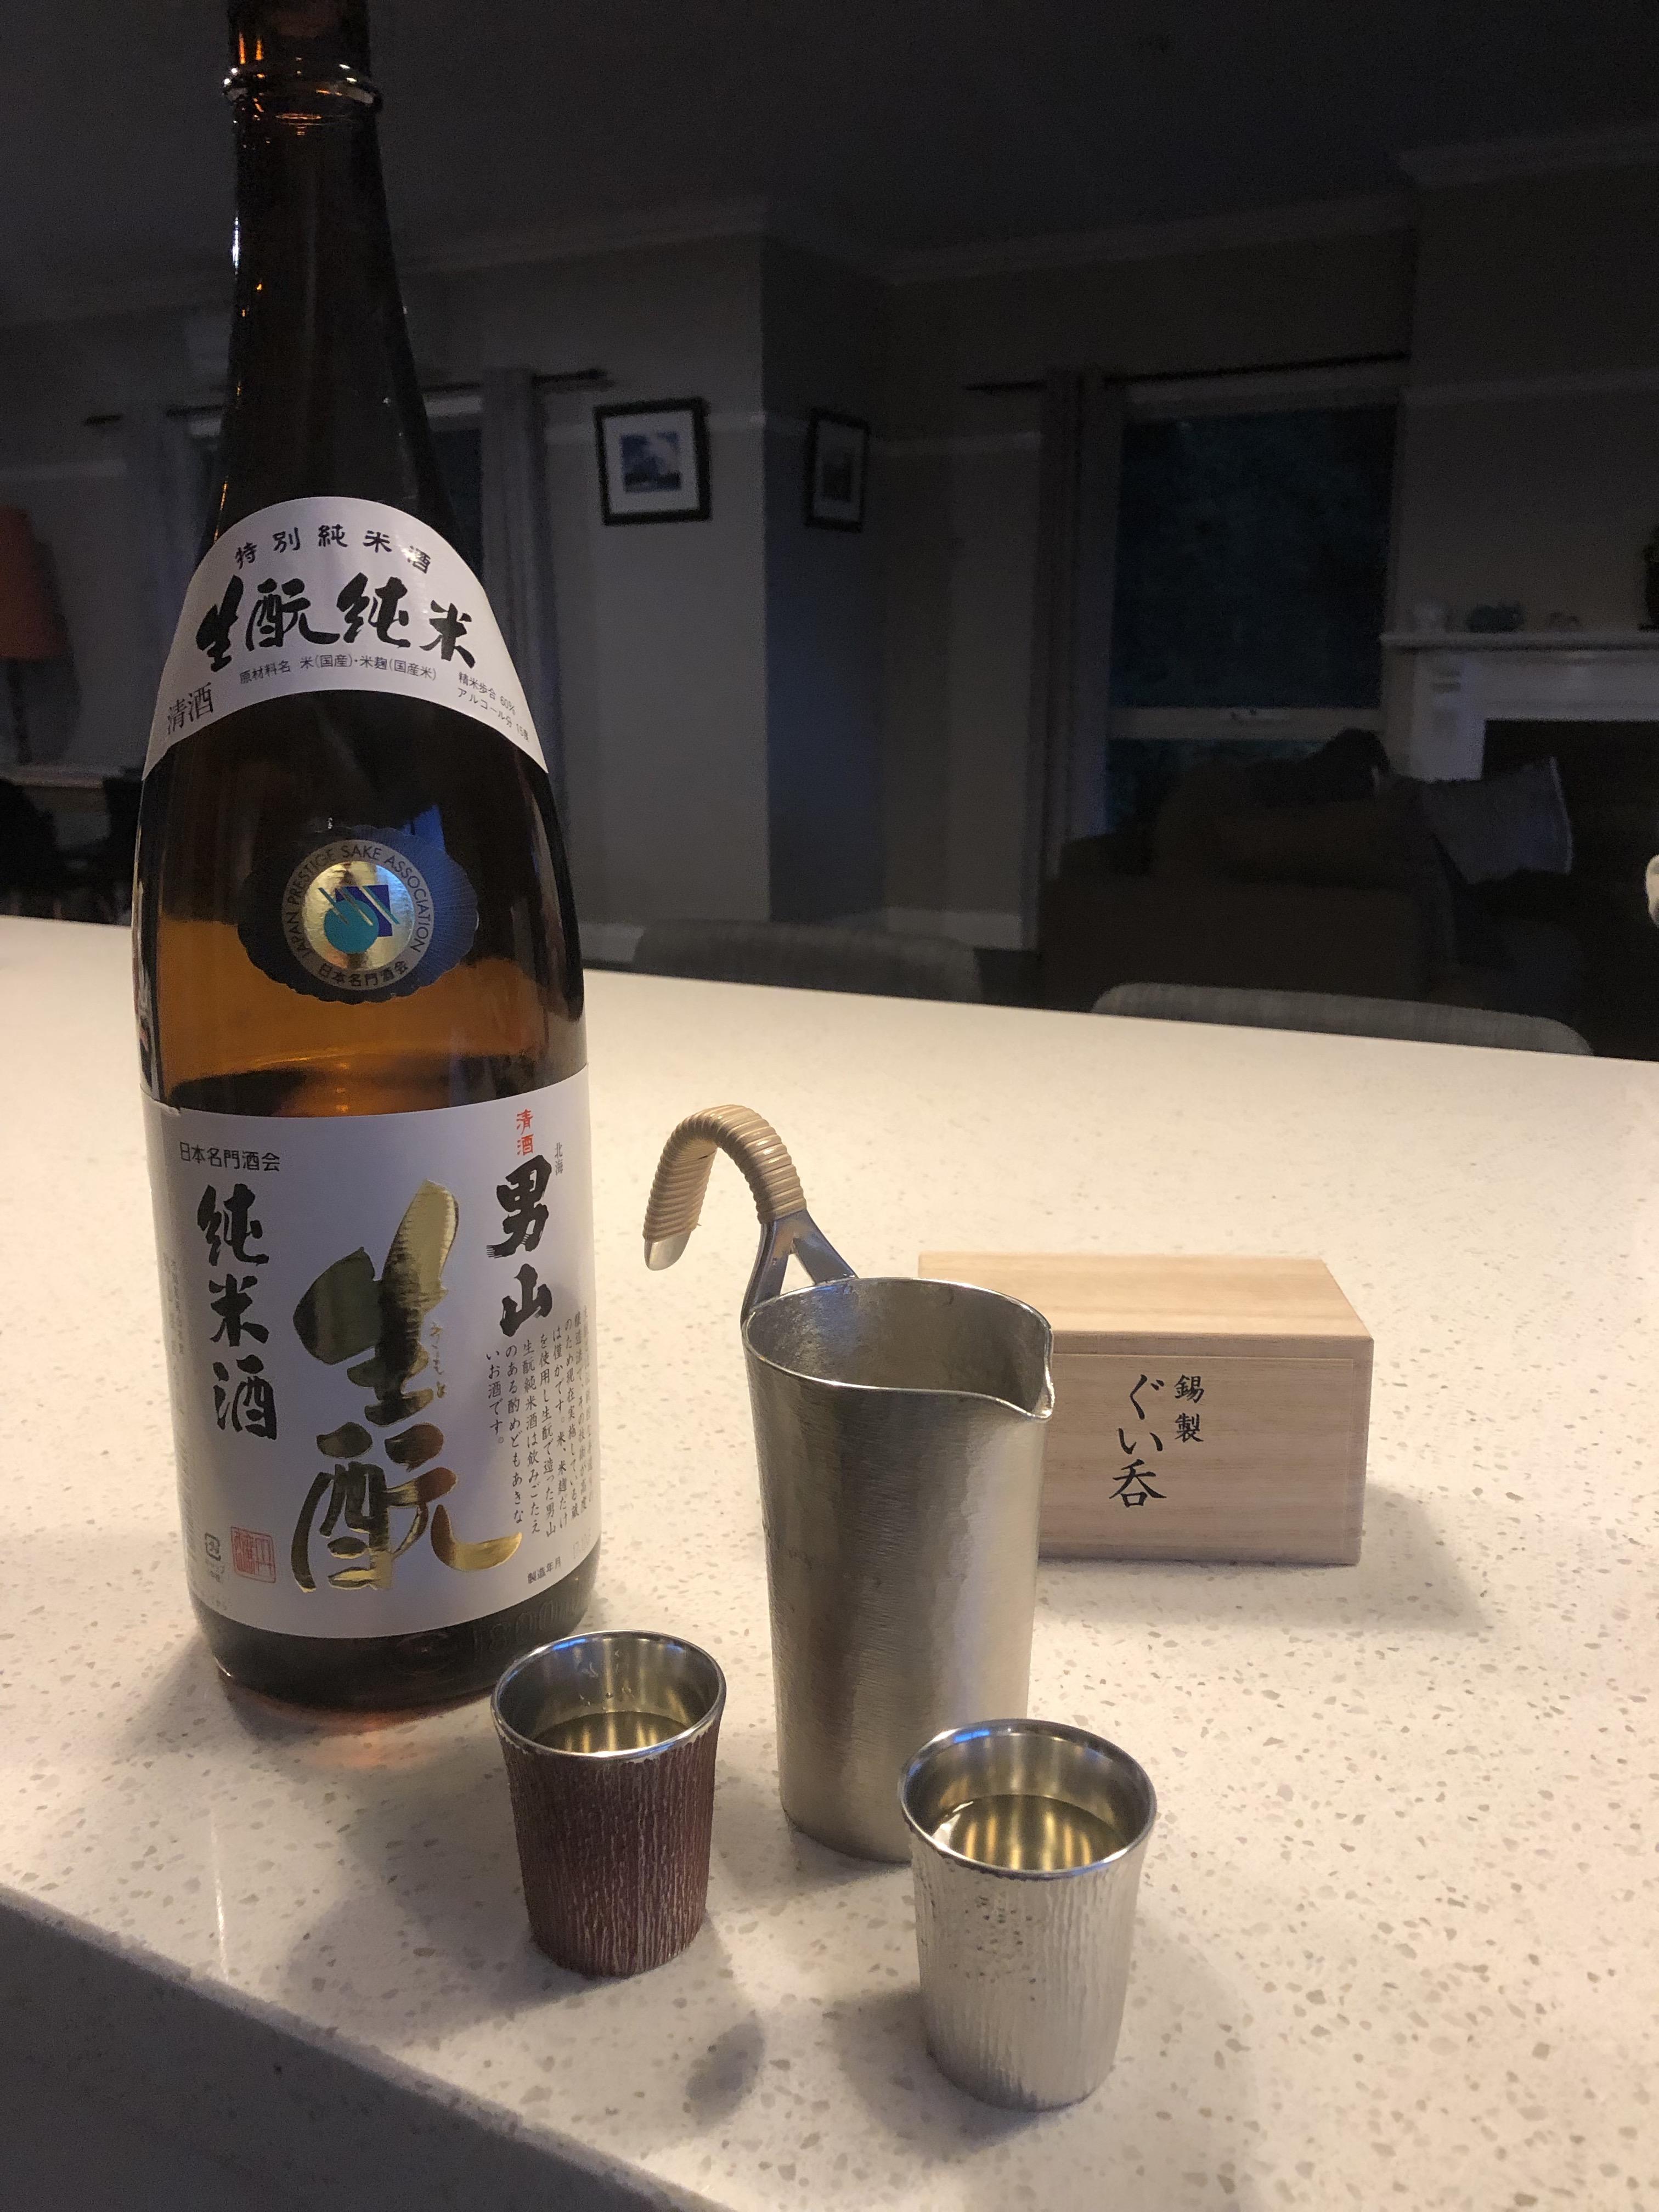 Otokoyama Kimoto Junmai 1.8 litre bottle with pewter tanpo and two pewter ochoko filled with sake from Hokkaido, Japan